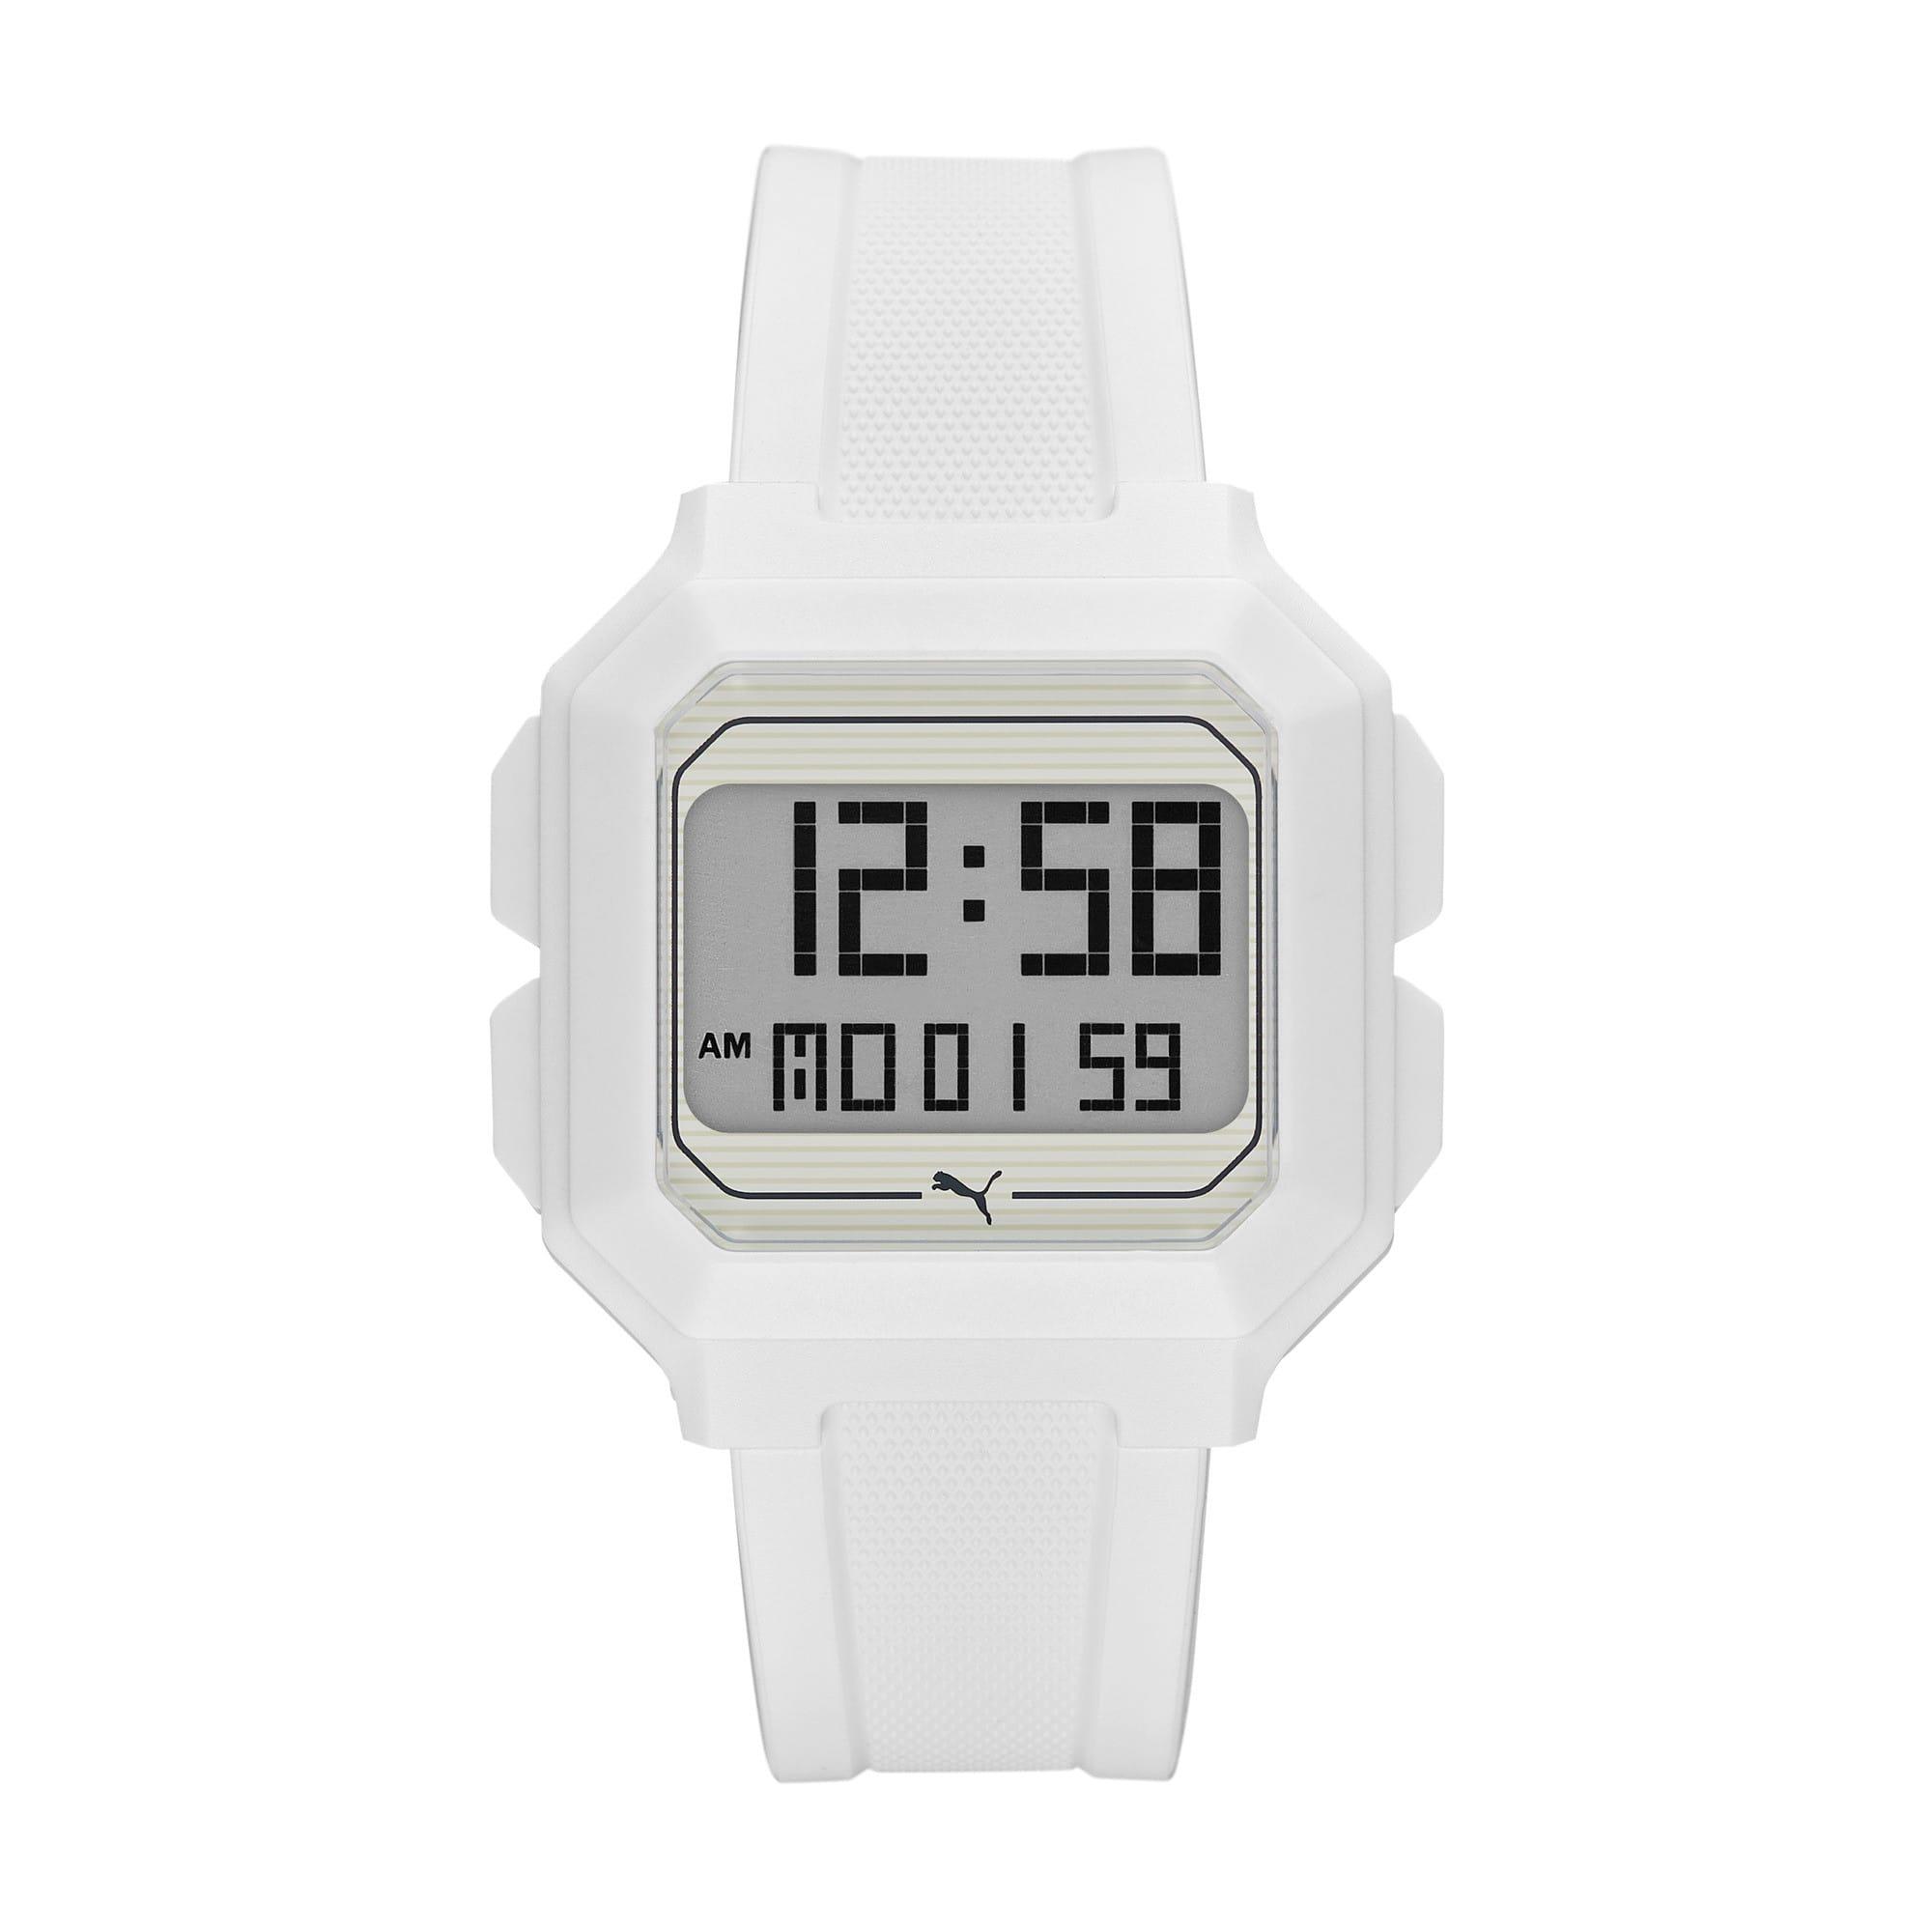 Thumbnail 1 of Remix White Digital Watch, White/White, medium